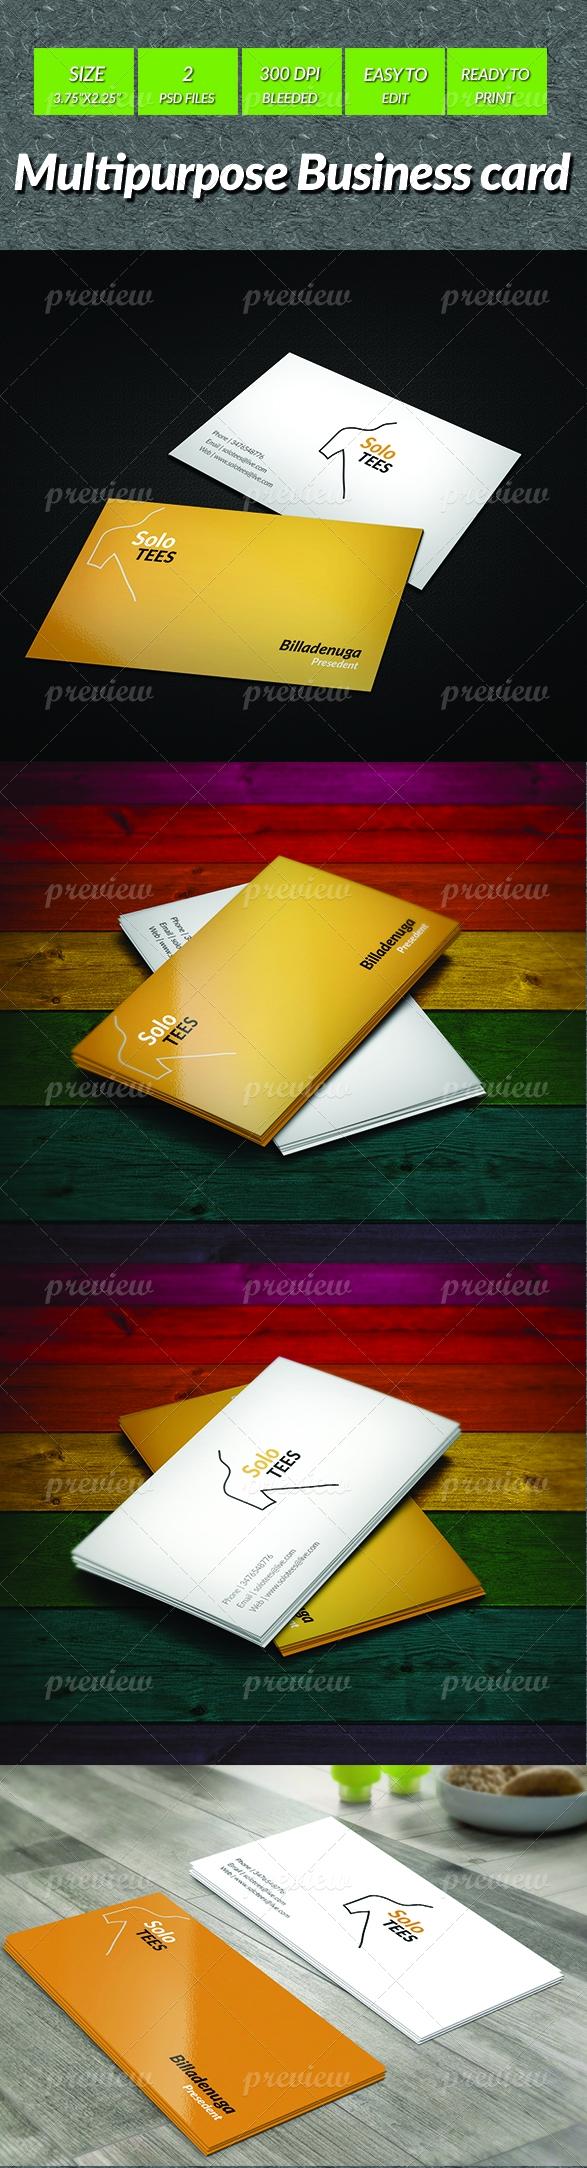 Multipurpose Business Card 2